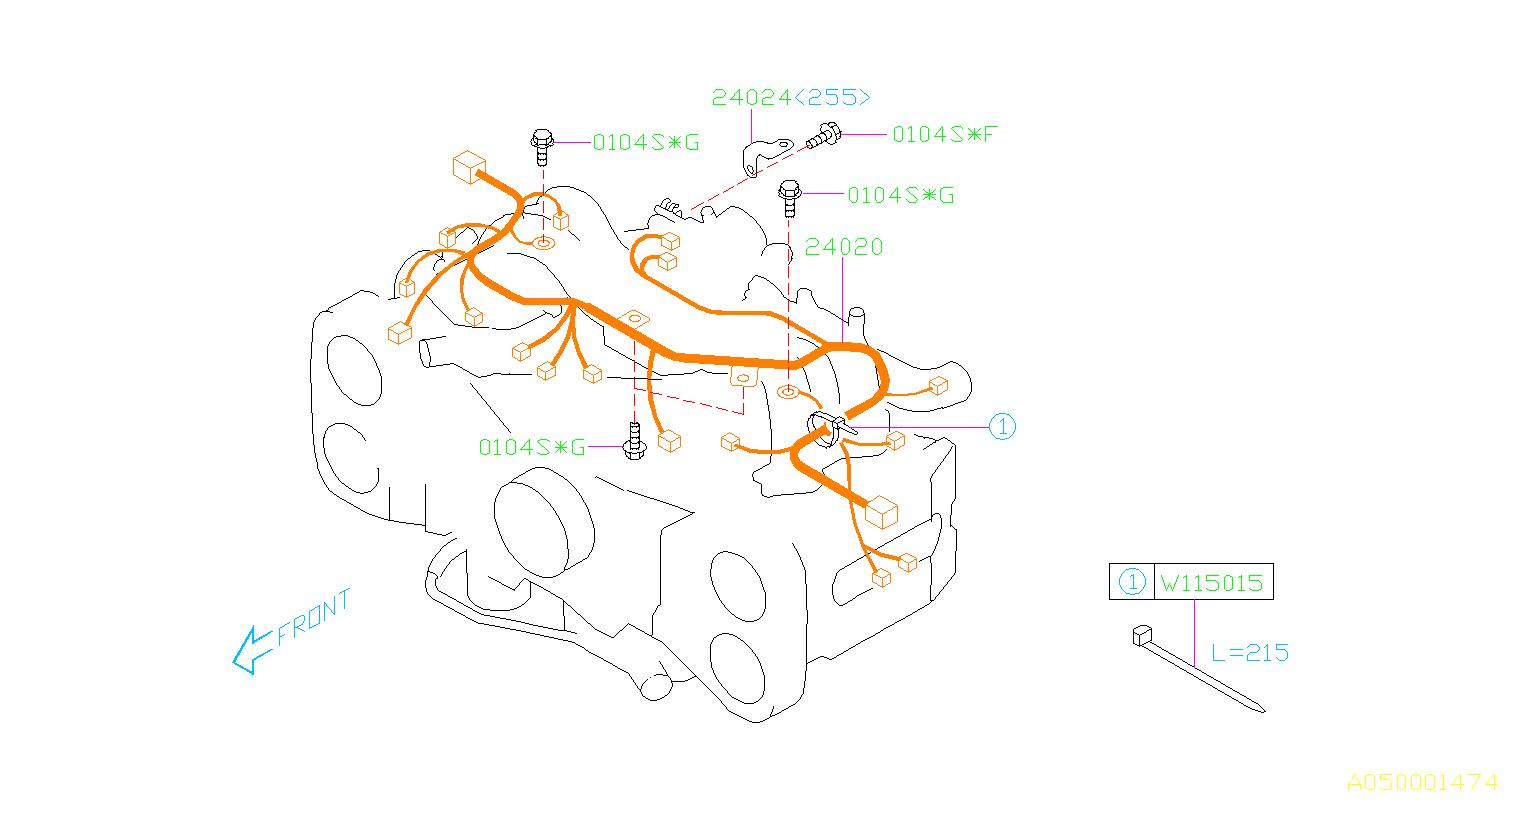 2003 Subaru Impreza  205  5mt 4wd Wrx Wagon Engine Wiring Harness  Wiring Harness Used For The